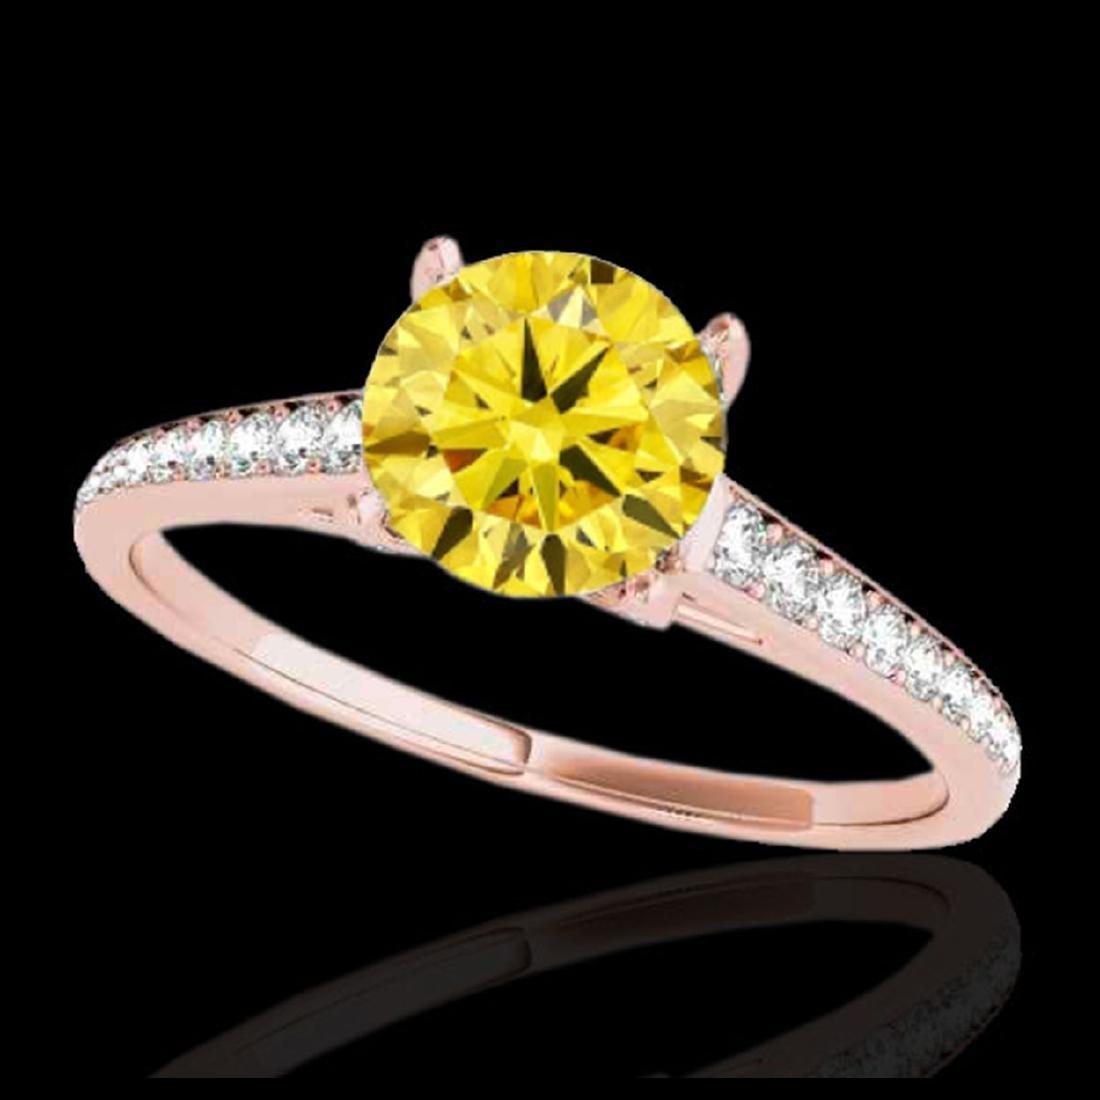 2 ctw SI/I Fancy Intense Yellow Diamond Ring 10K Rose